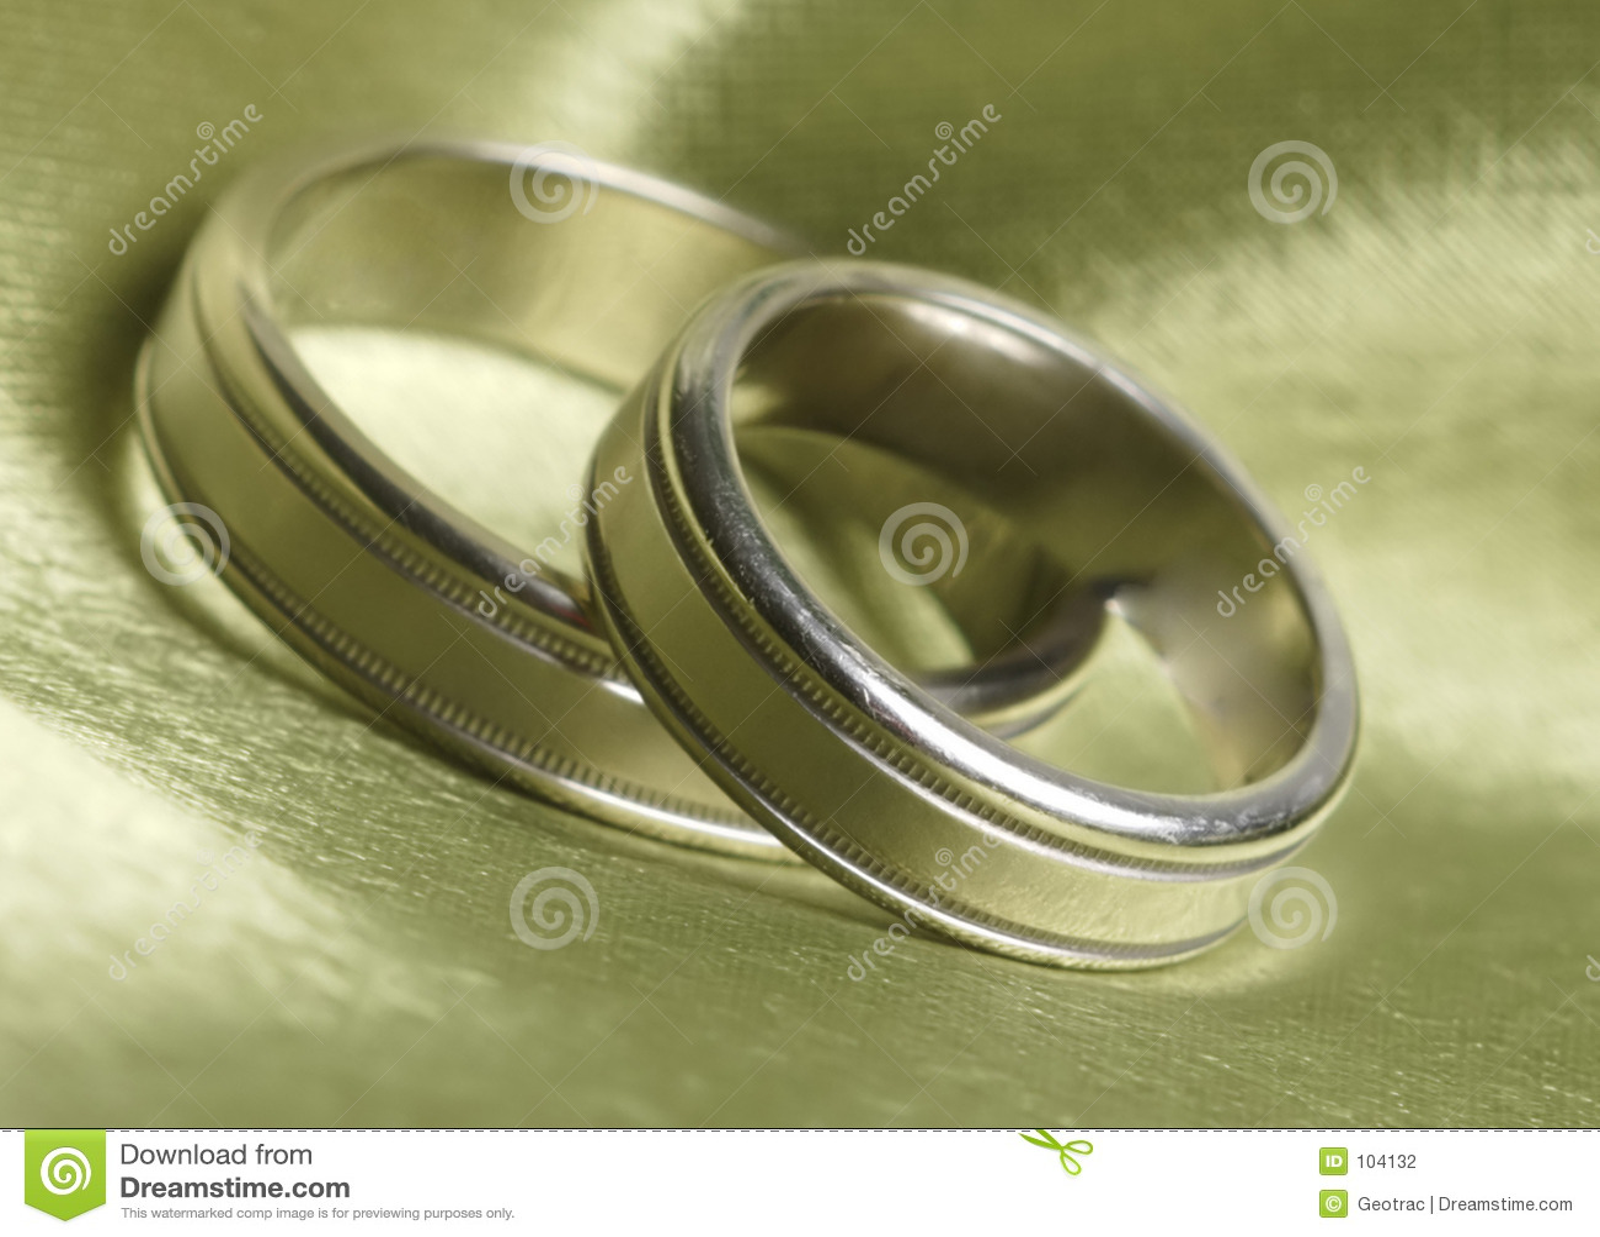 Wedding bands up close on green satin